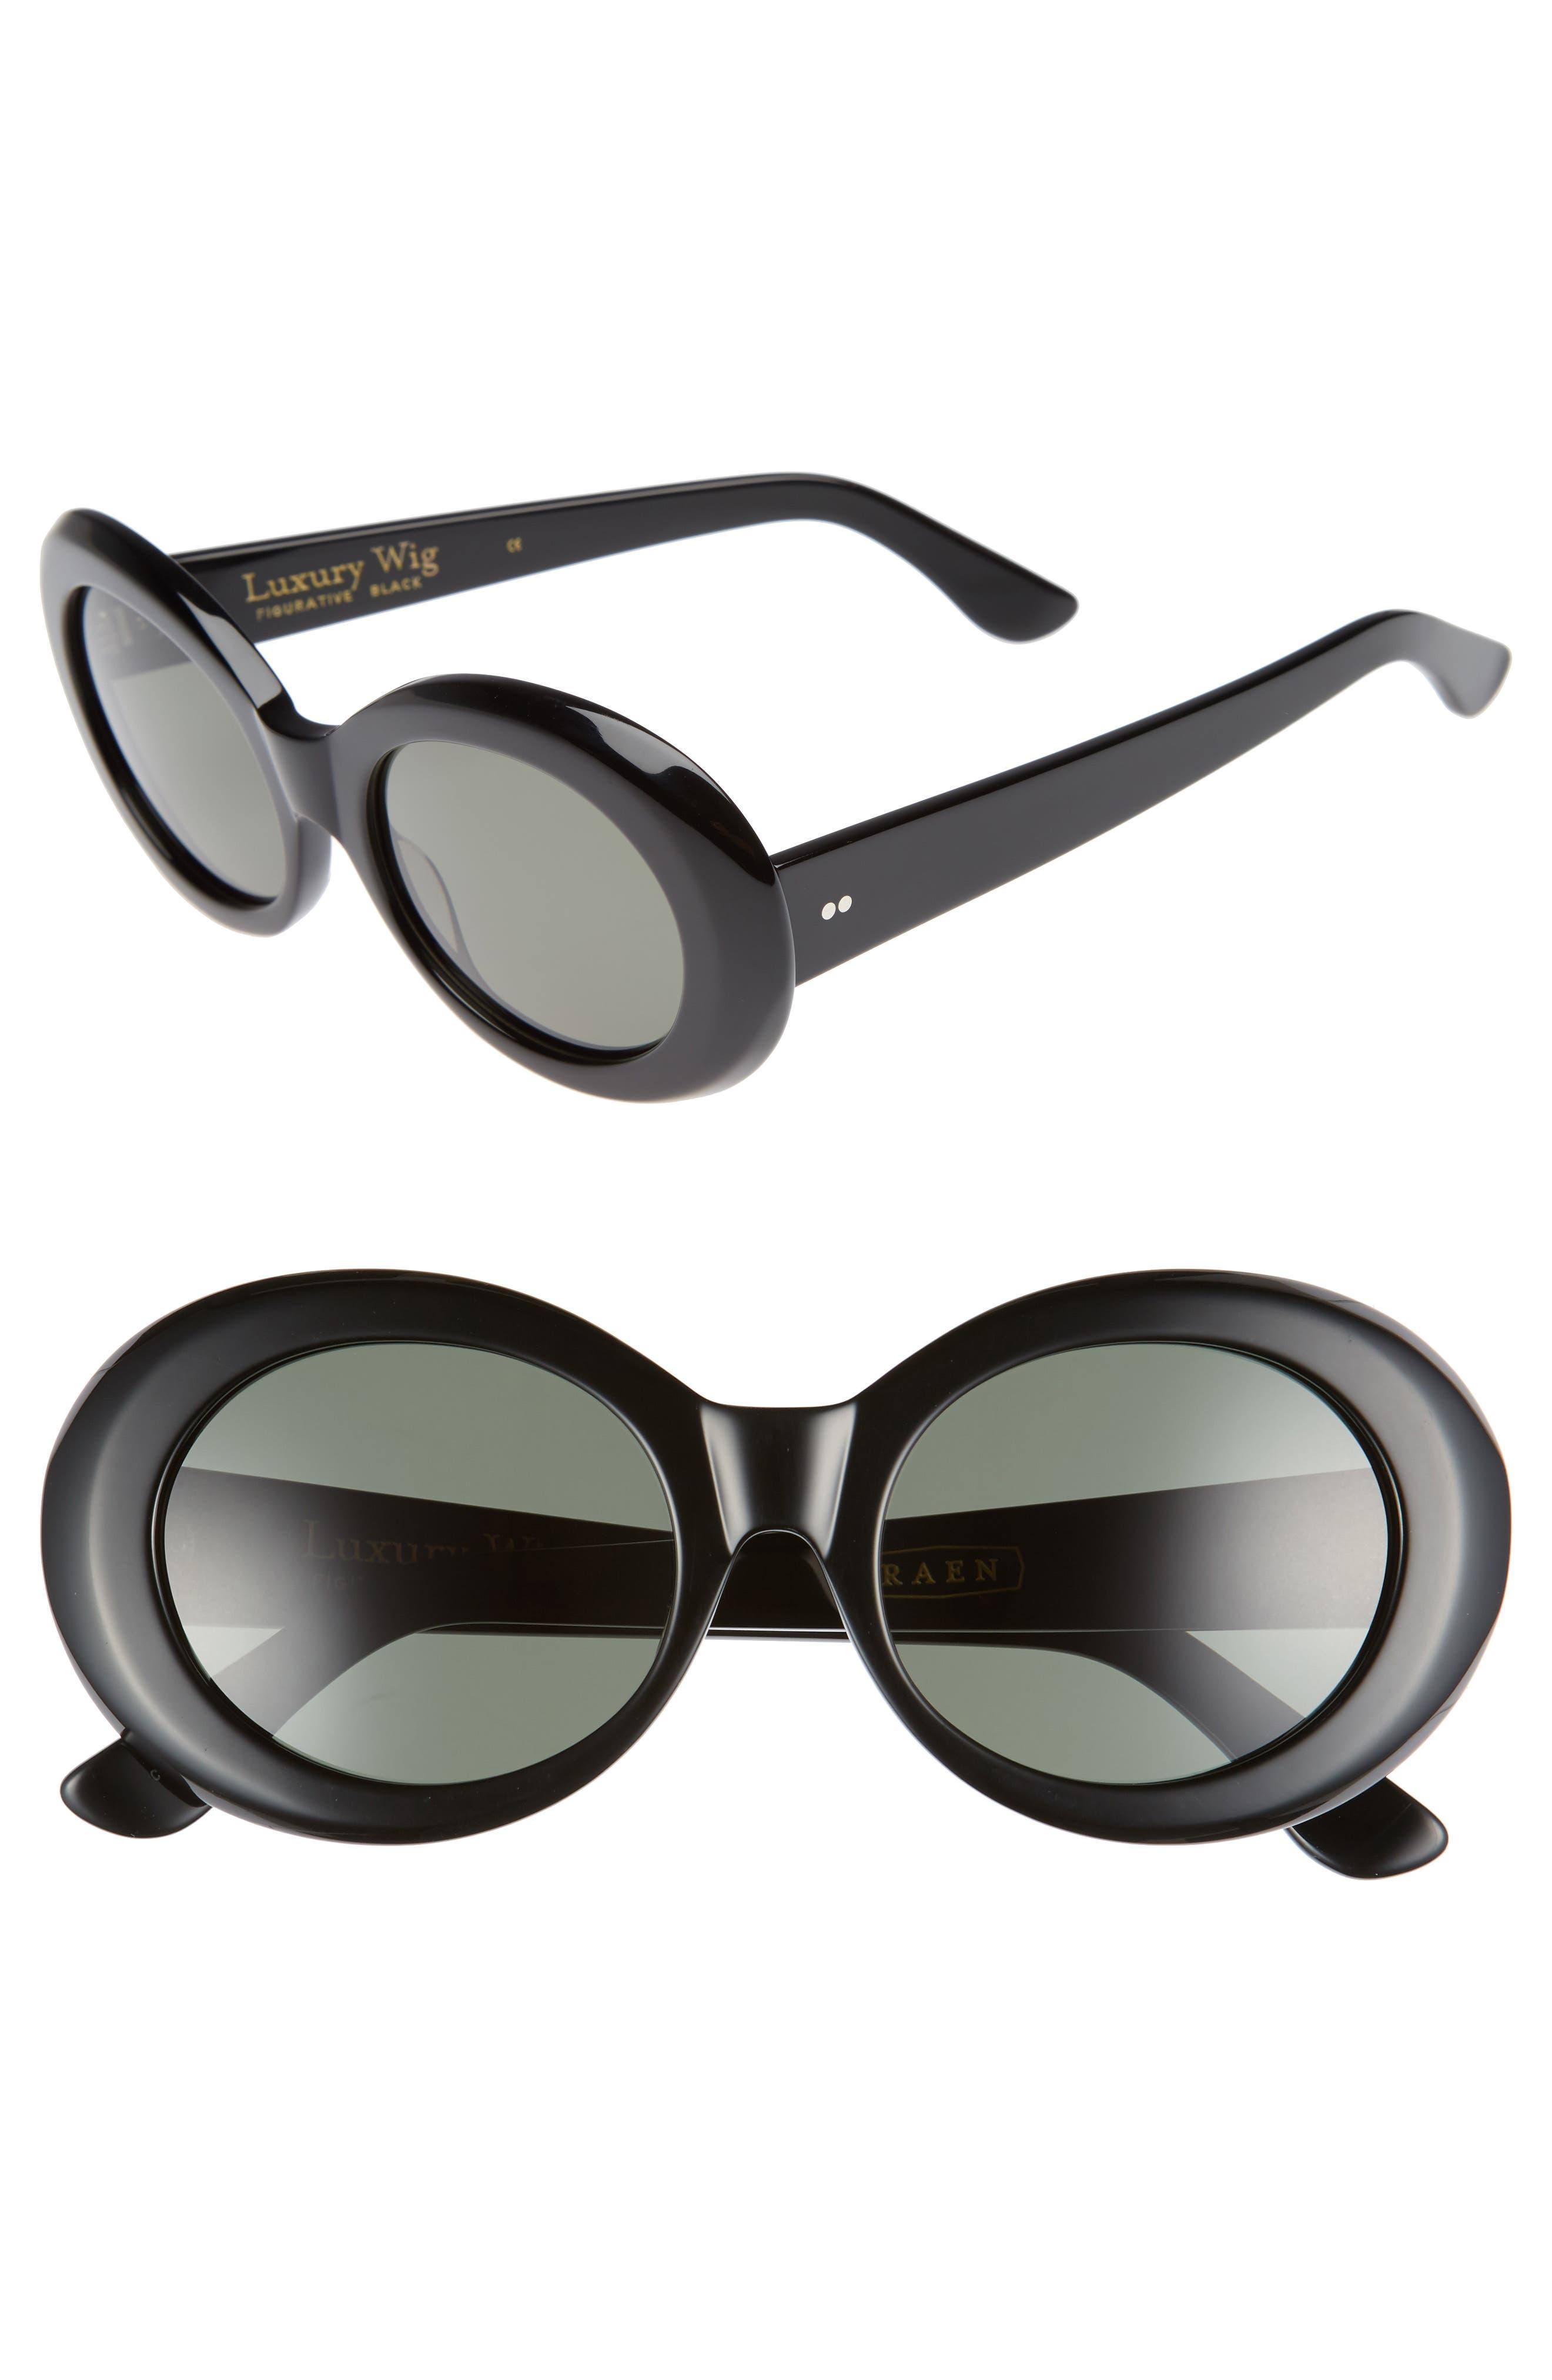 RAEN x Alex Knost Luxury Wig Figurative 53mm Sunglasses